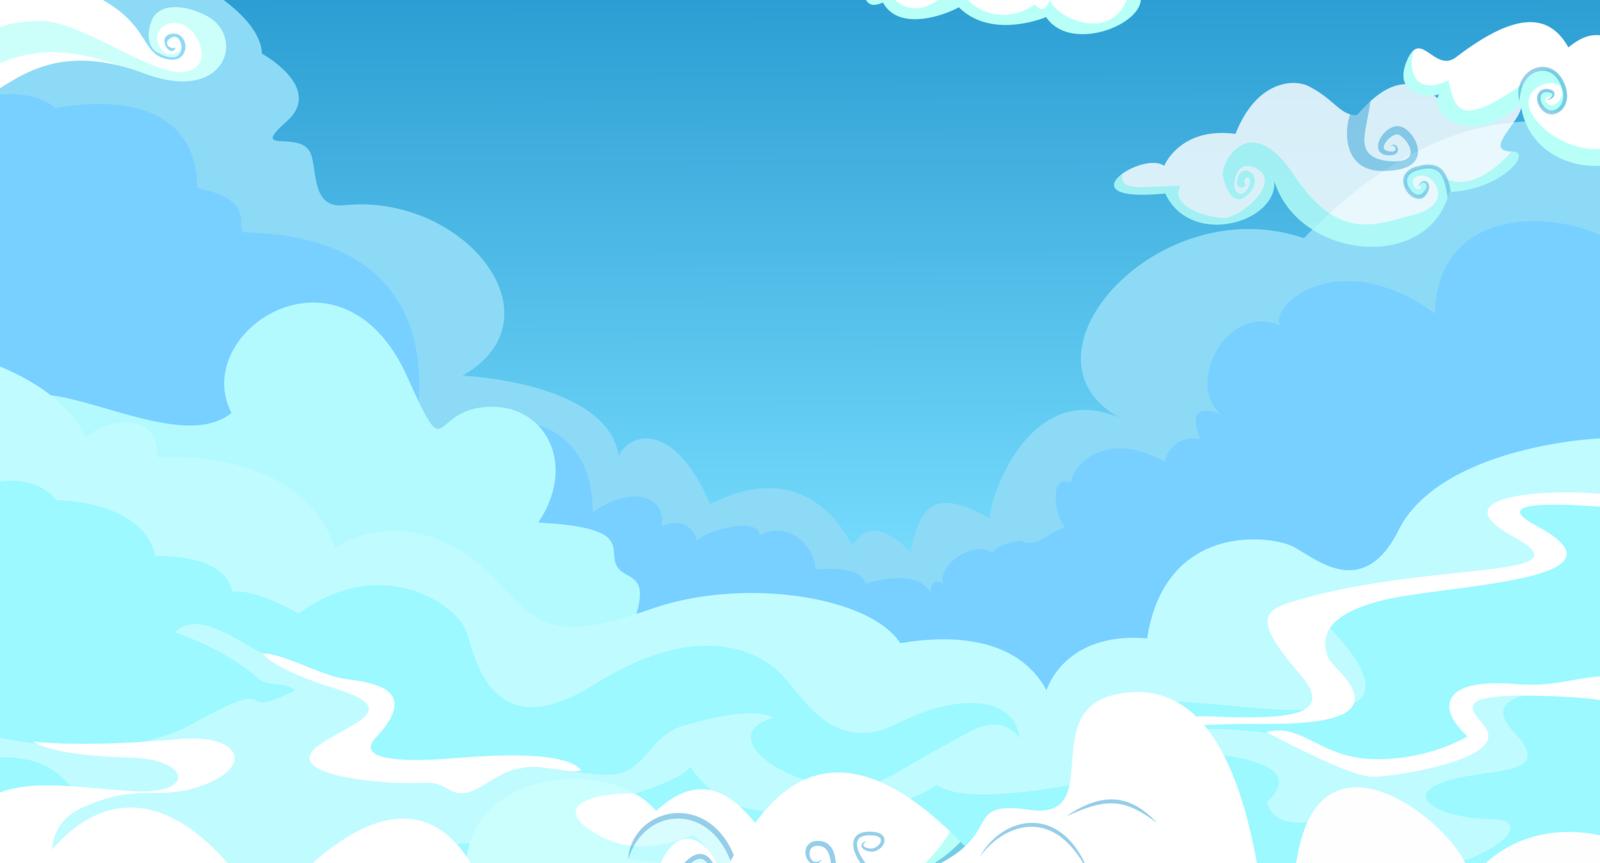 Sky Clipart & Sky Clip Art Images.